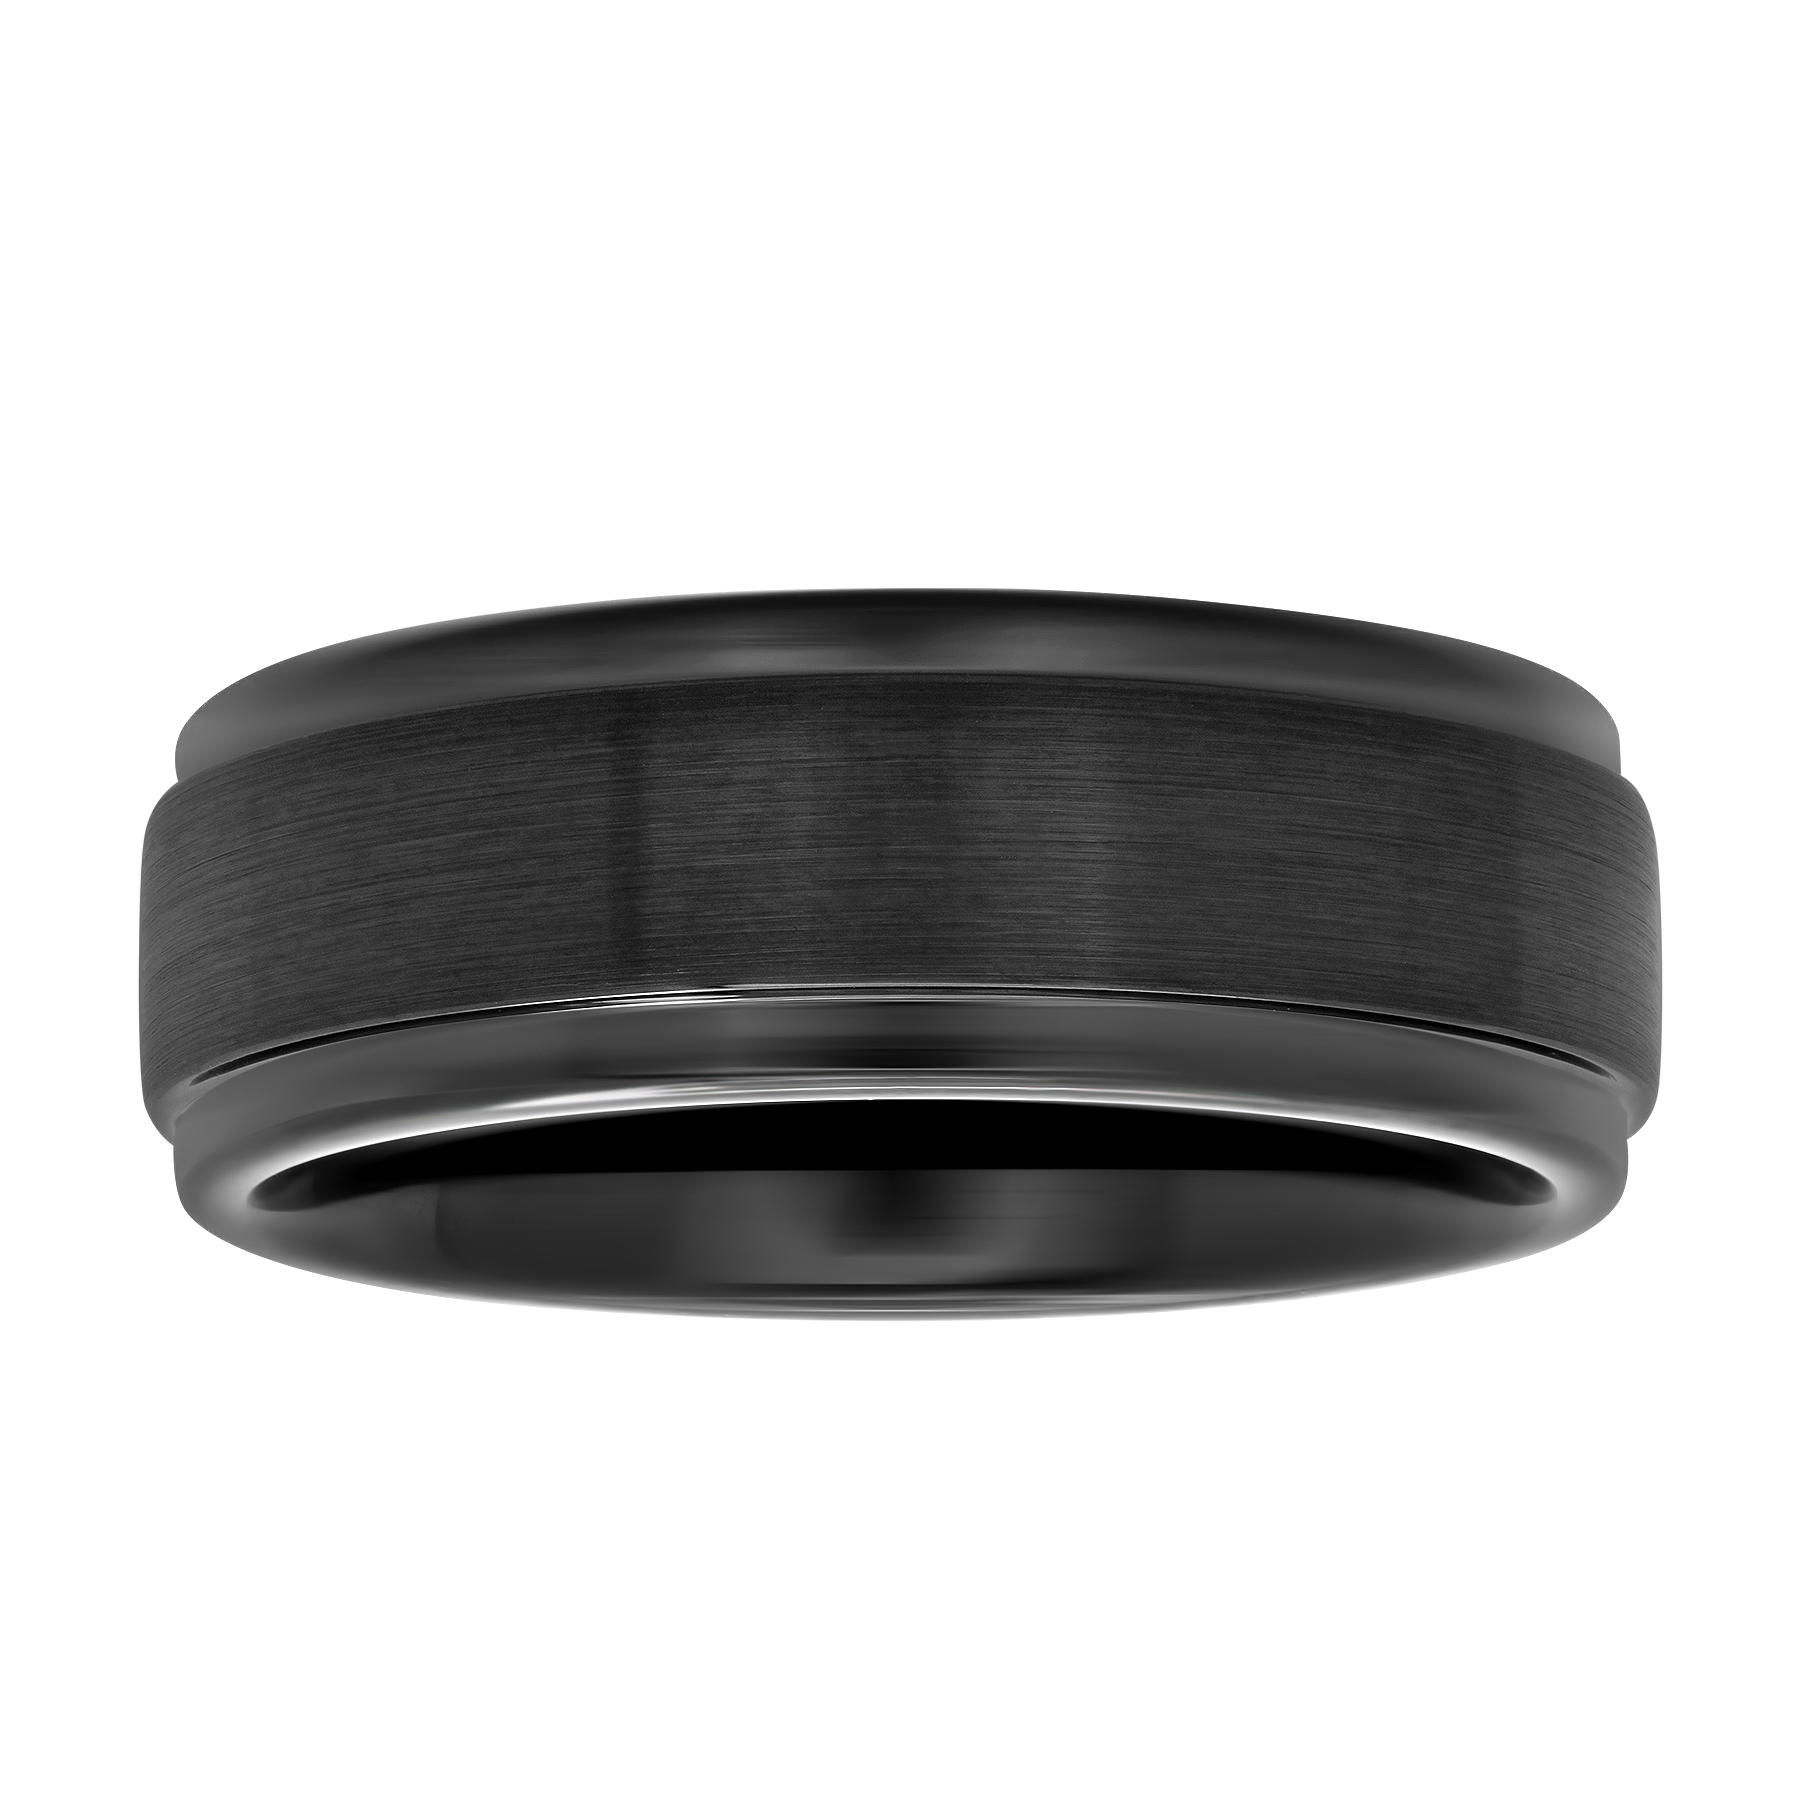 Men's Black IP Tungsten 8MM Step Edge Comfort Fit Wedding Band - Mens Ring